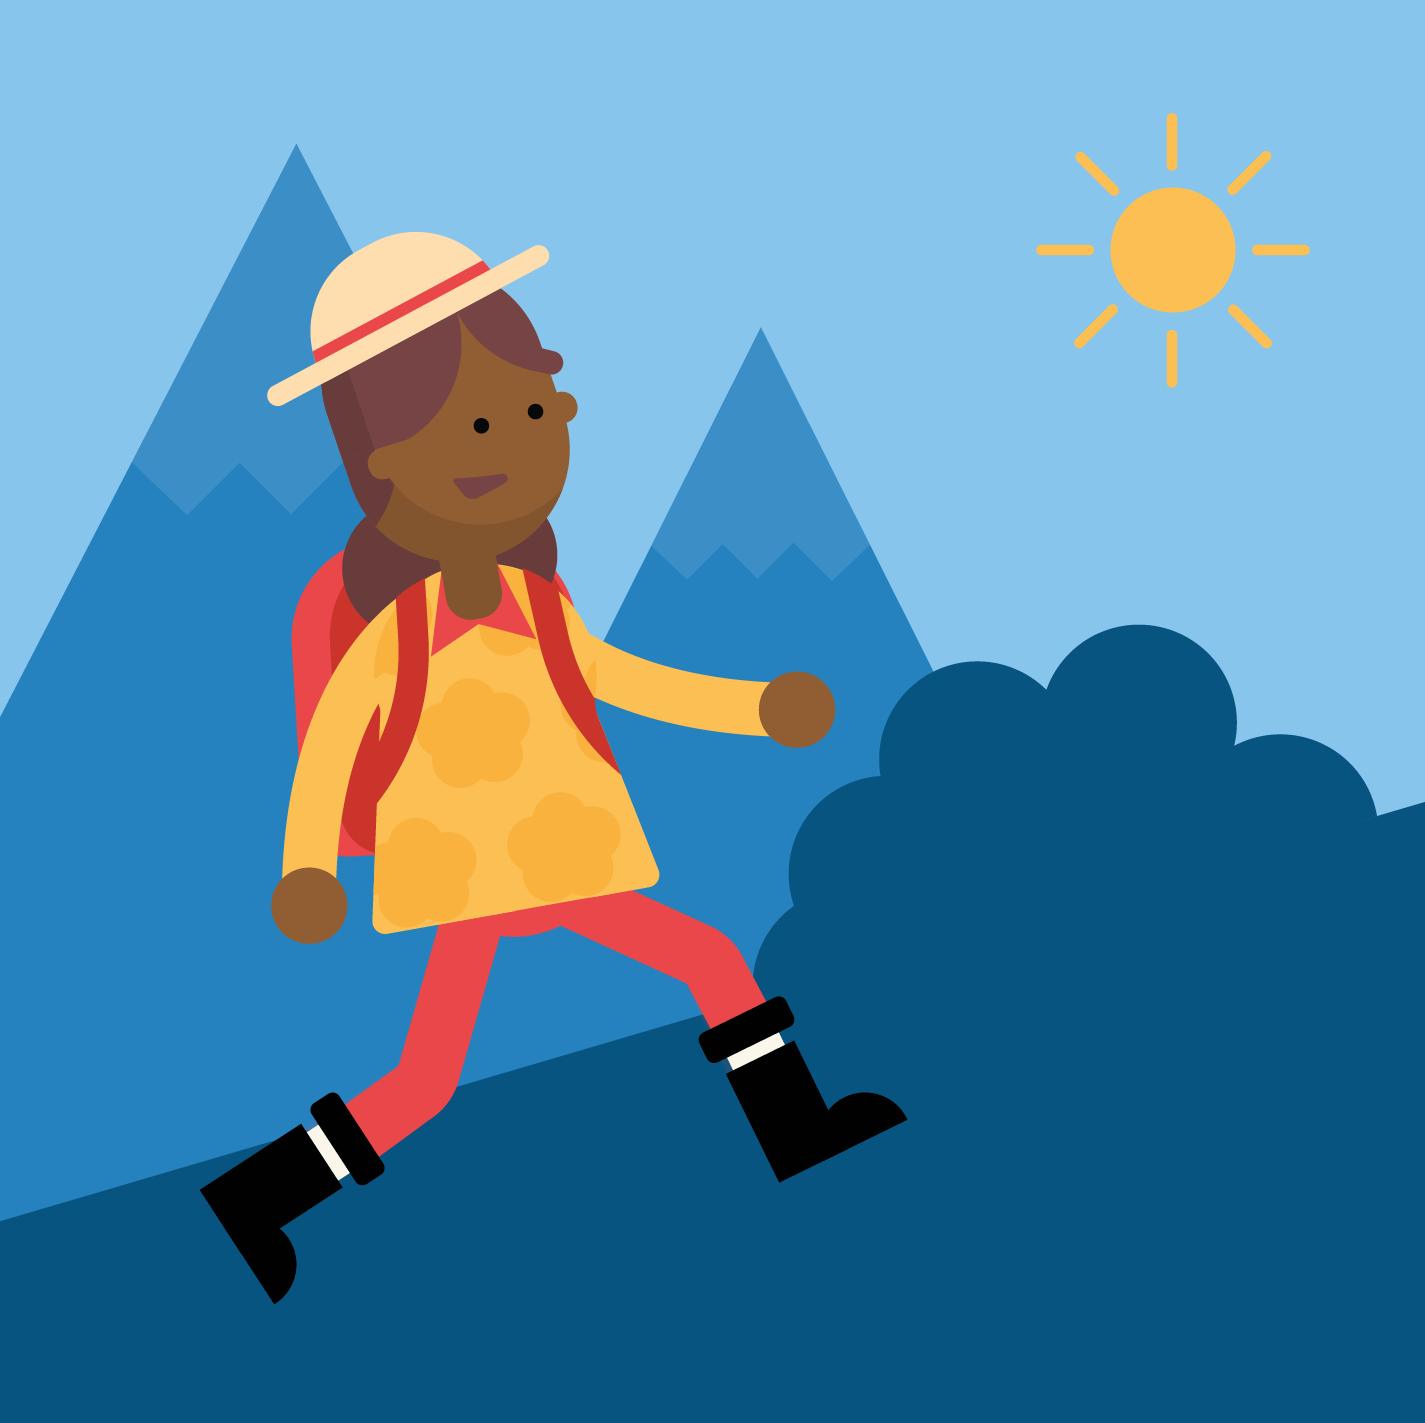 scientist hiking uphill